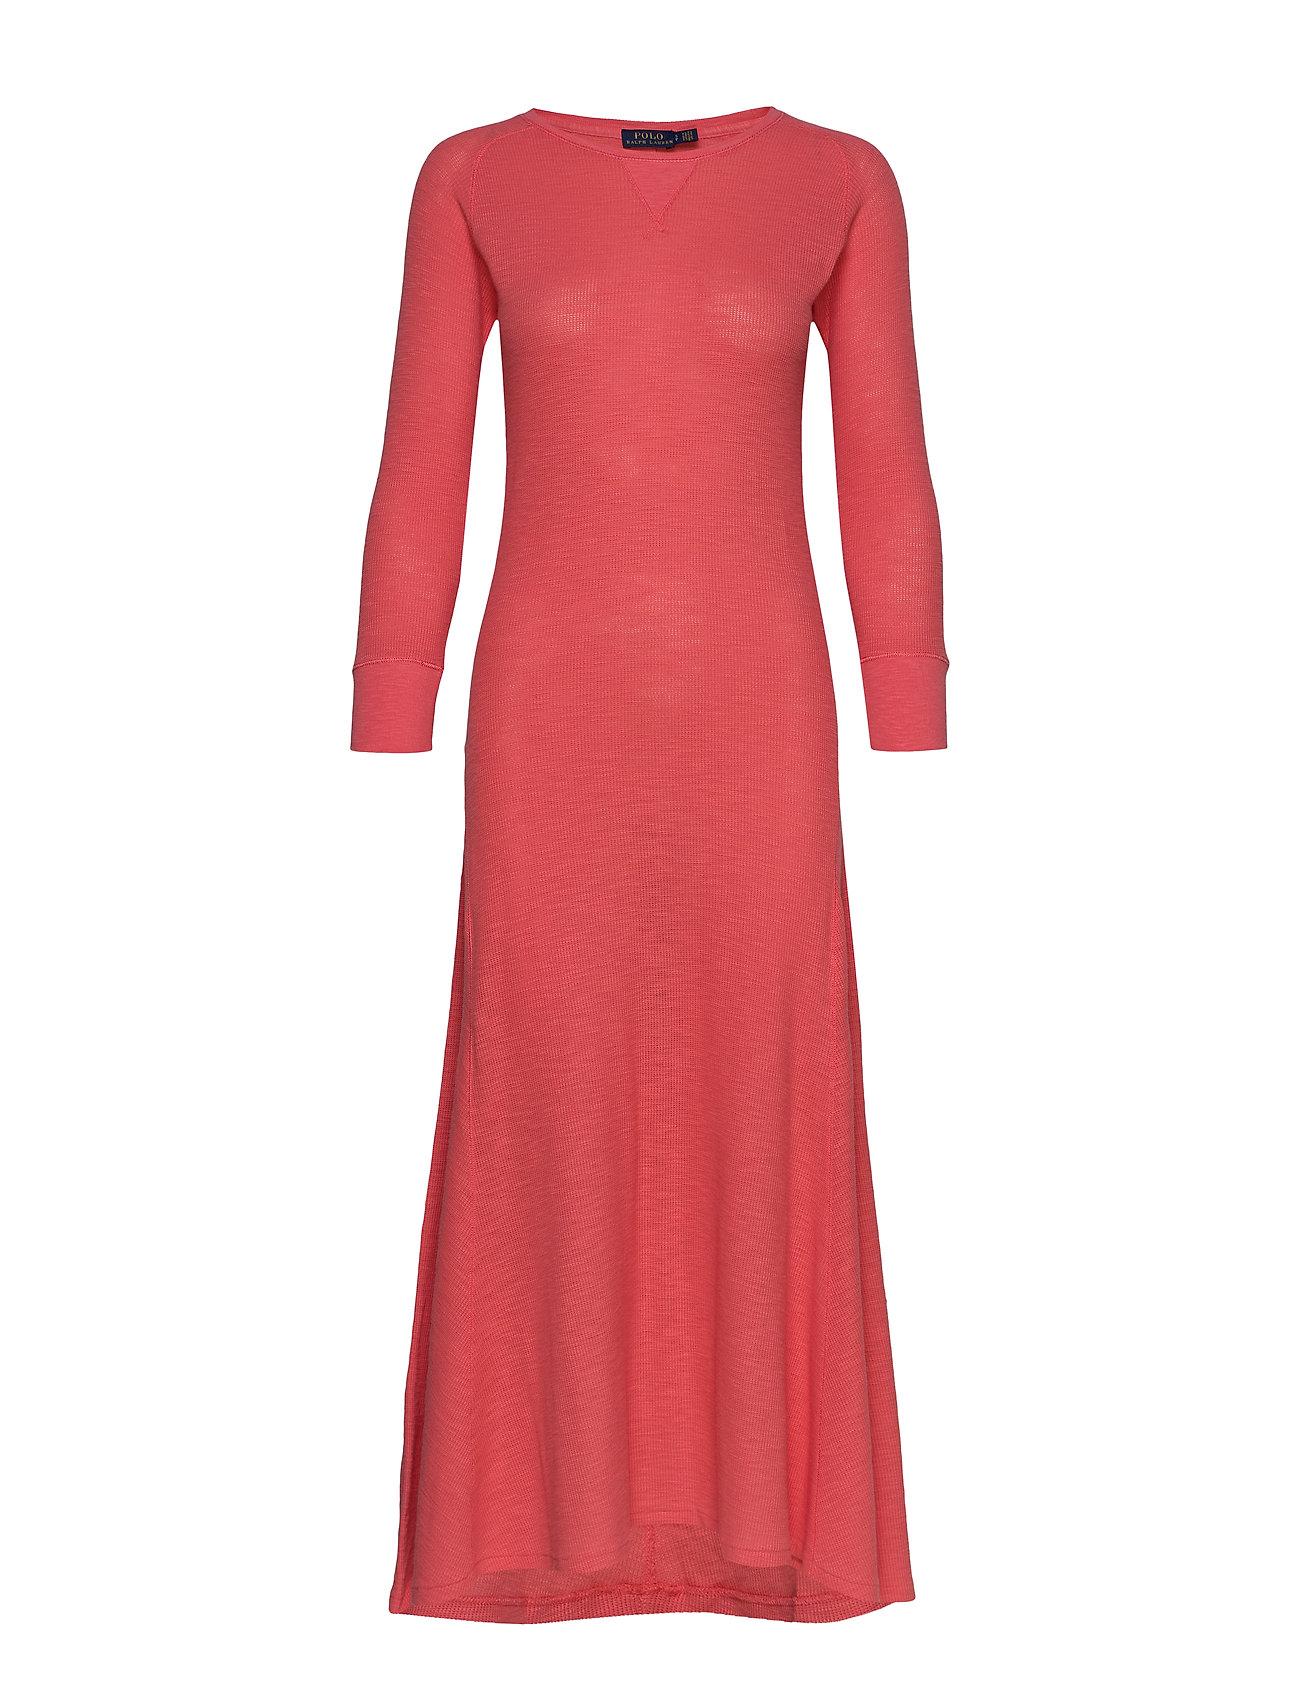 Polo Ralph Lauren Waffle-Knit Henley Dress - AMALFI RED